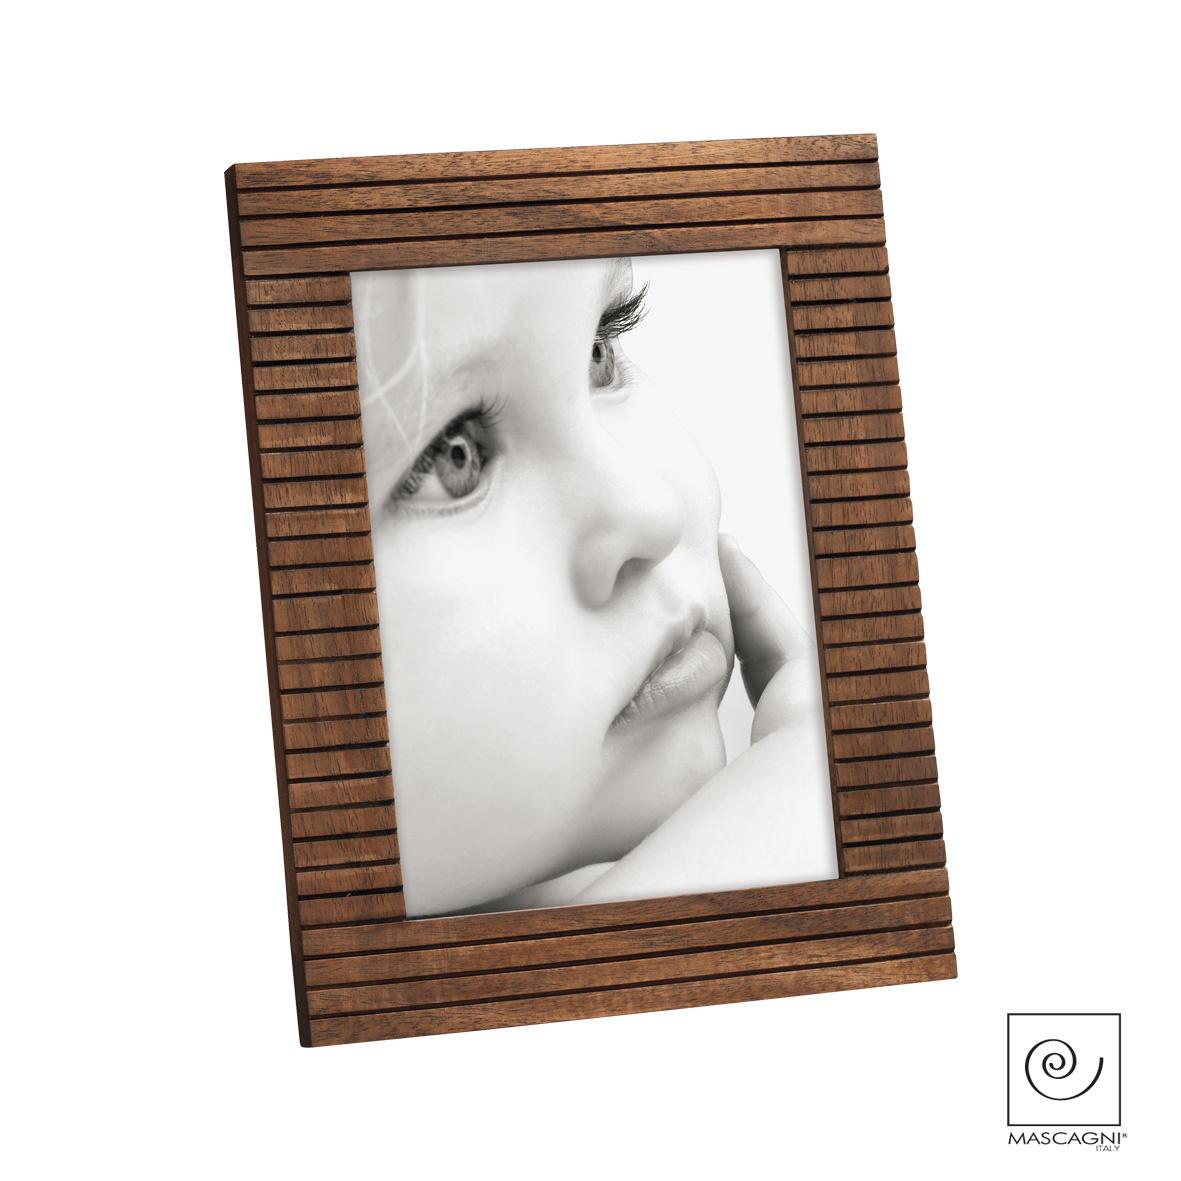 Art Mascagni A758 PHOTO FRAME 13X18 - COL. MOOR